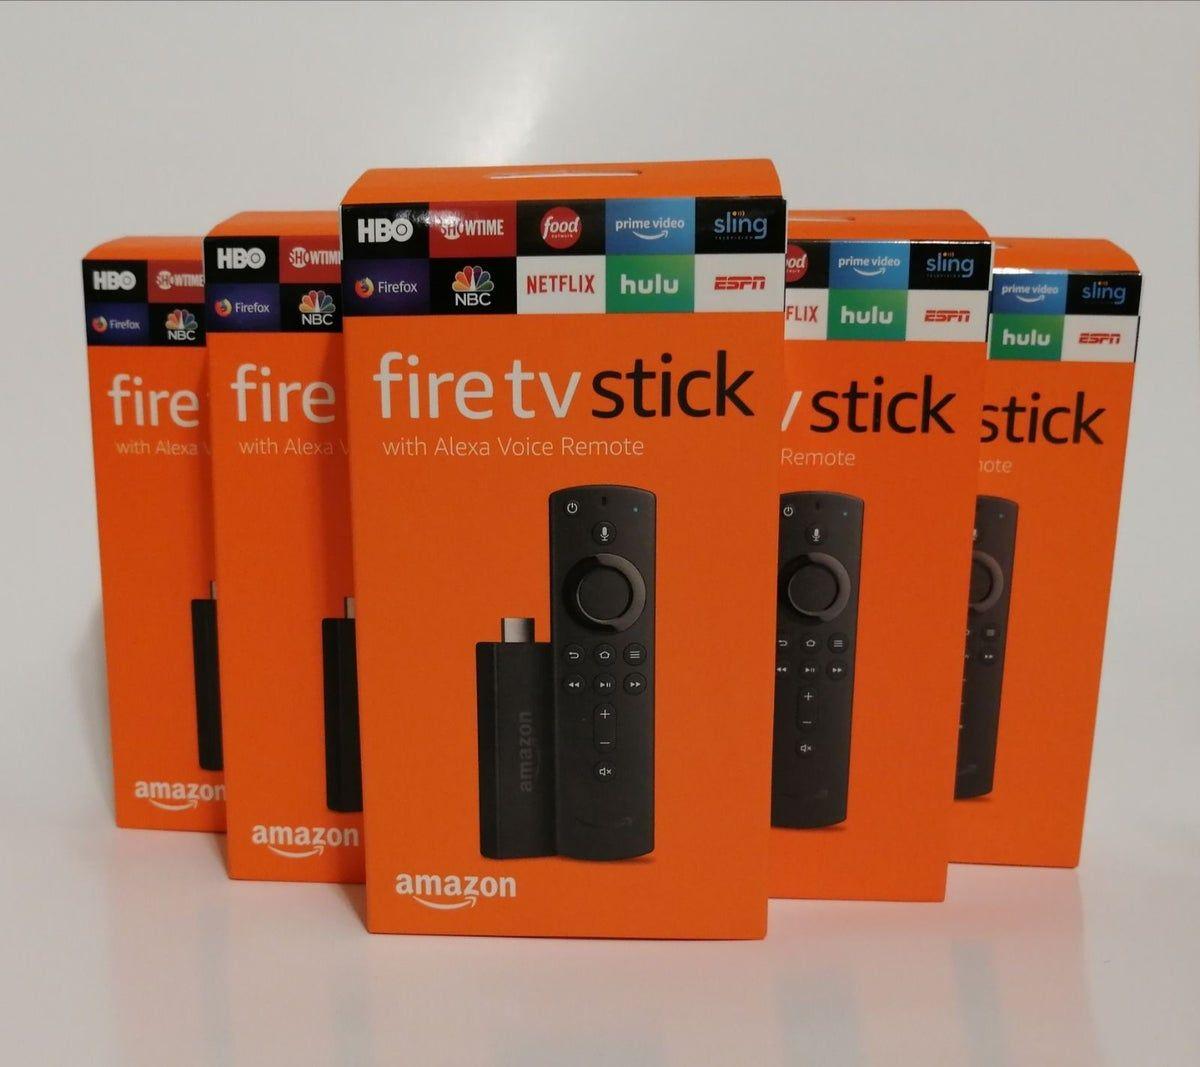 Pin By Gaming Tet1 On اشتراك في قناة Fire Tv Stick Alexa Voice Voice Remote